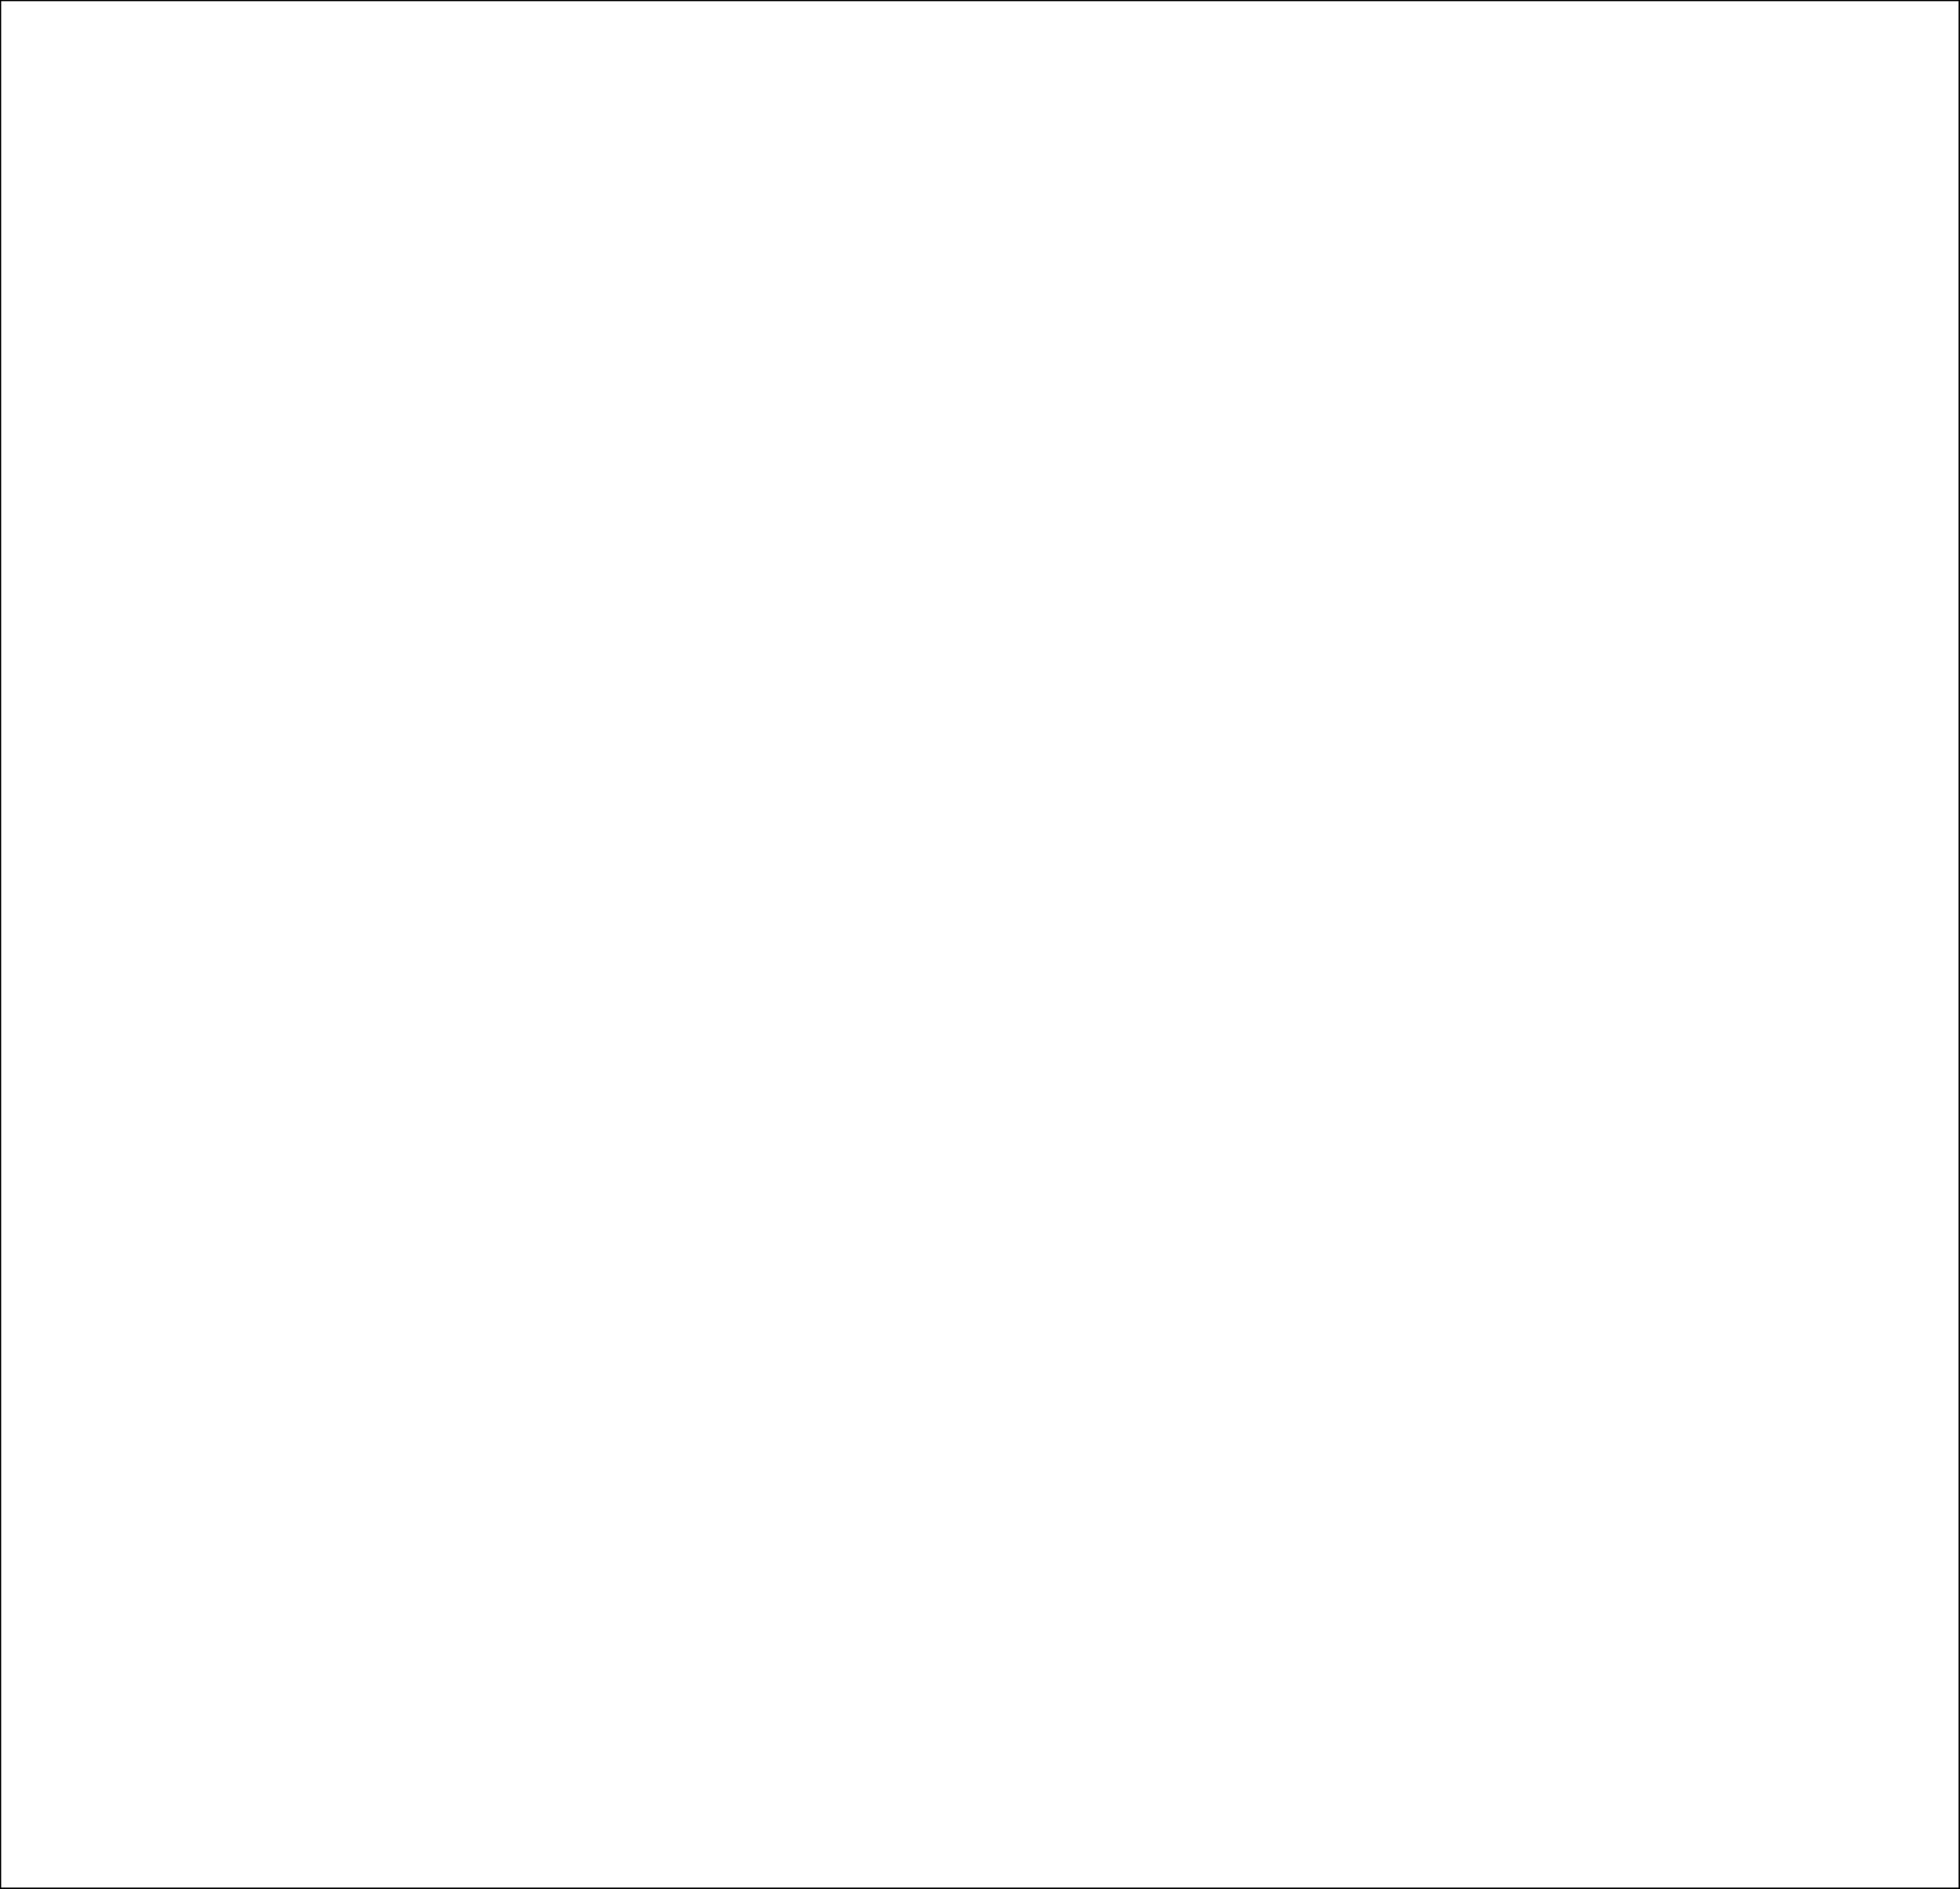 2016 - Lucia L. Prieto Godino, Raphael Rytz, Benoîte Bargeton, Liliane Abuin, J. Roman Arguello,Matteo Dal Peraro and Richard Benton. Olfactory receptor pseudo-pseudogenes. Nature, 539, 93-97.